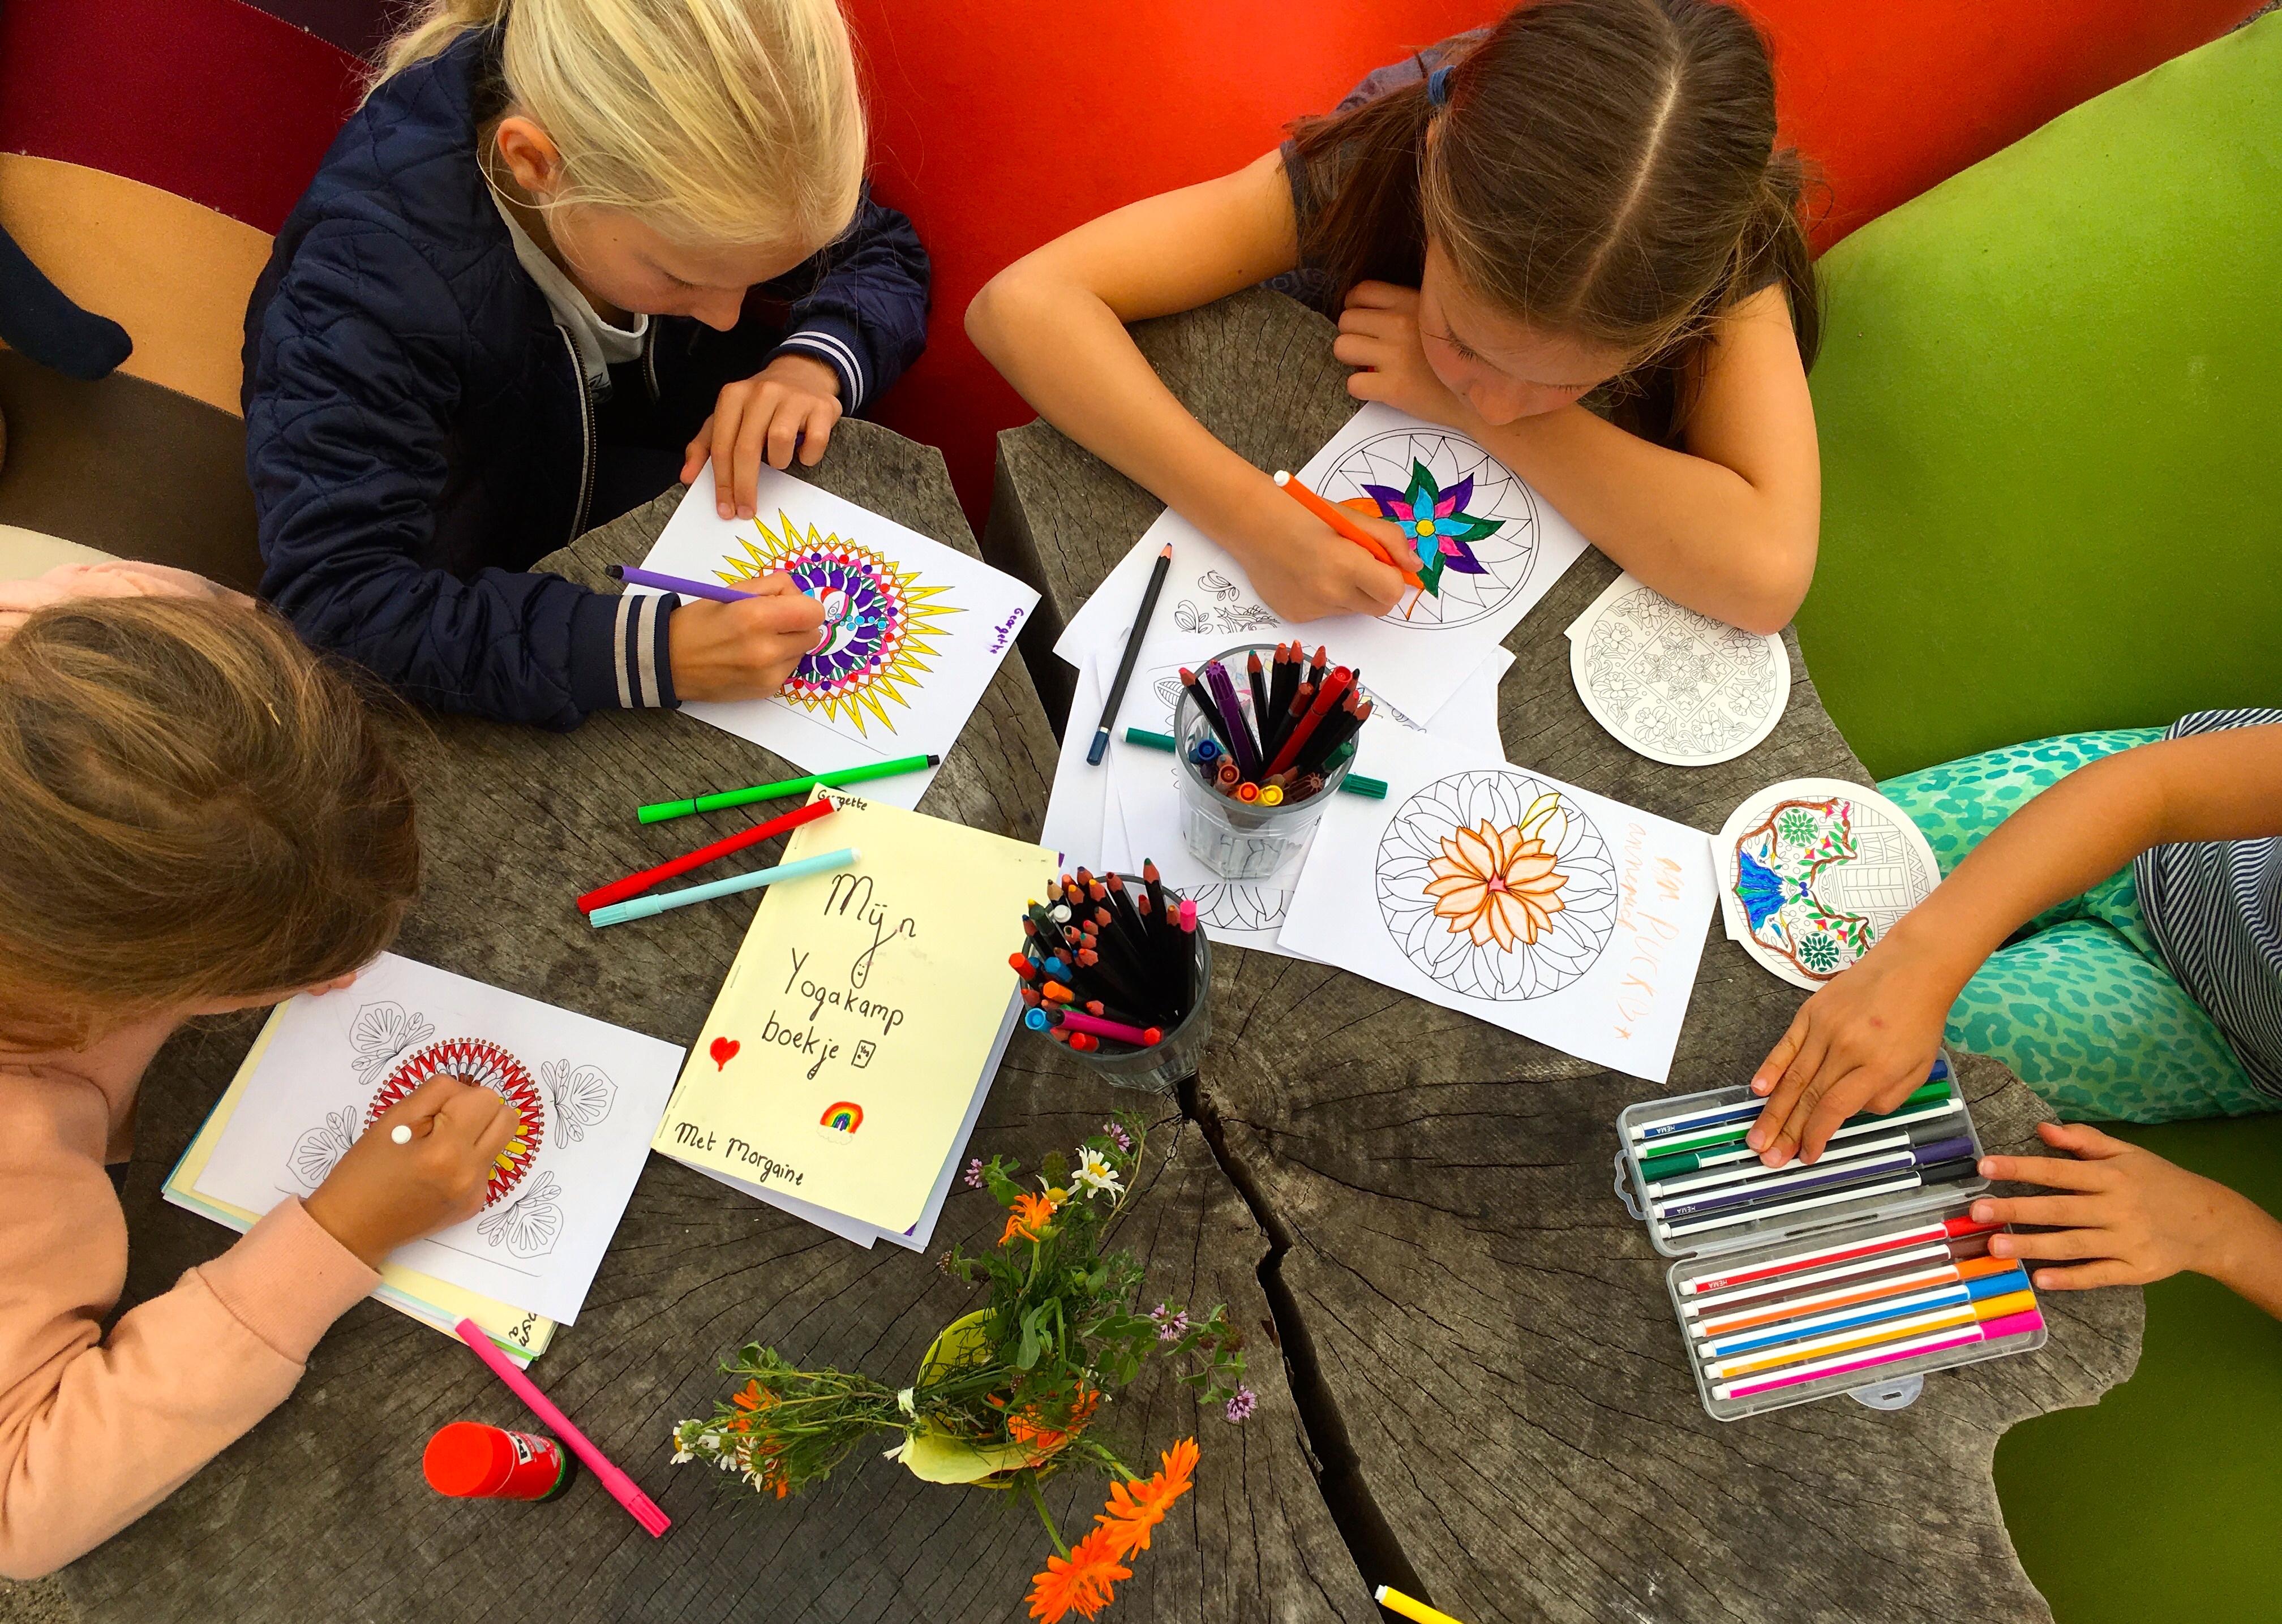 de Kinderyogatuin yogakamp zomerkamp - creativiteit - kinderyoga mindfulness meditatie massage buitenyoga Aemstel schooltuin Amsterdam Amstelveen